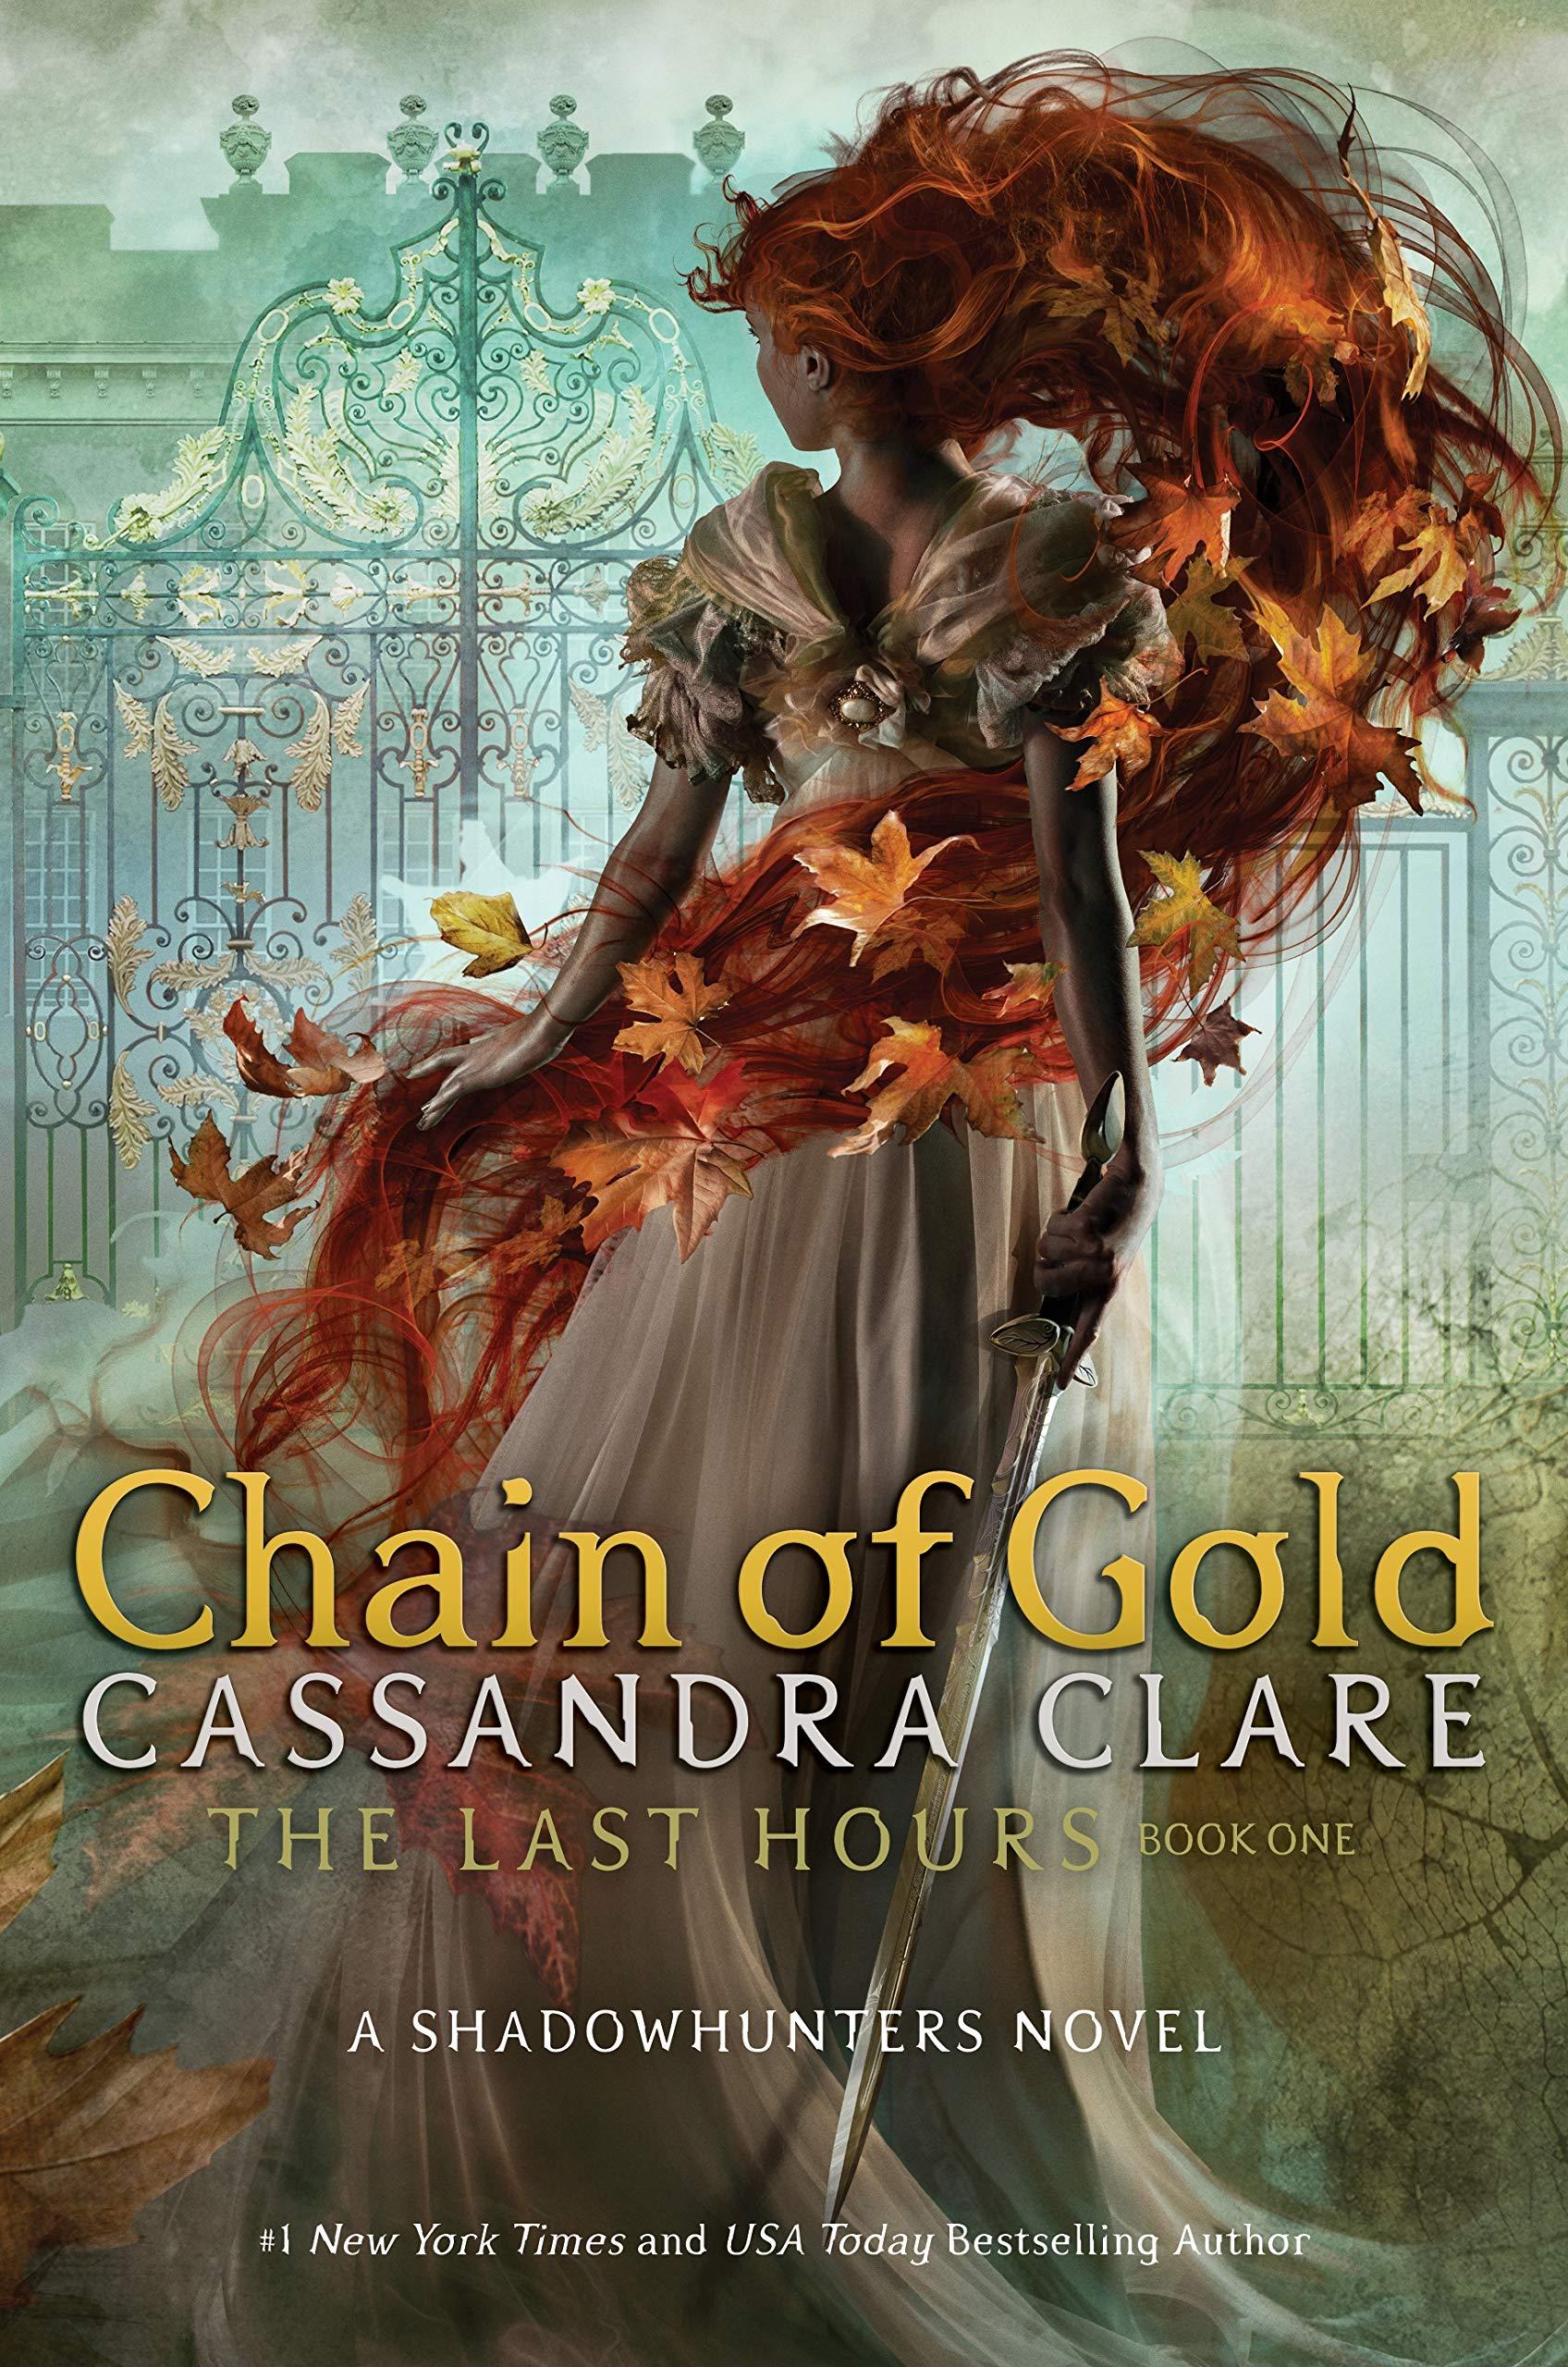 The Last Hours: Chain of Gold: Amazon.es: Cassandra Clare: Libros en  idiomas extranjeros